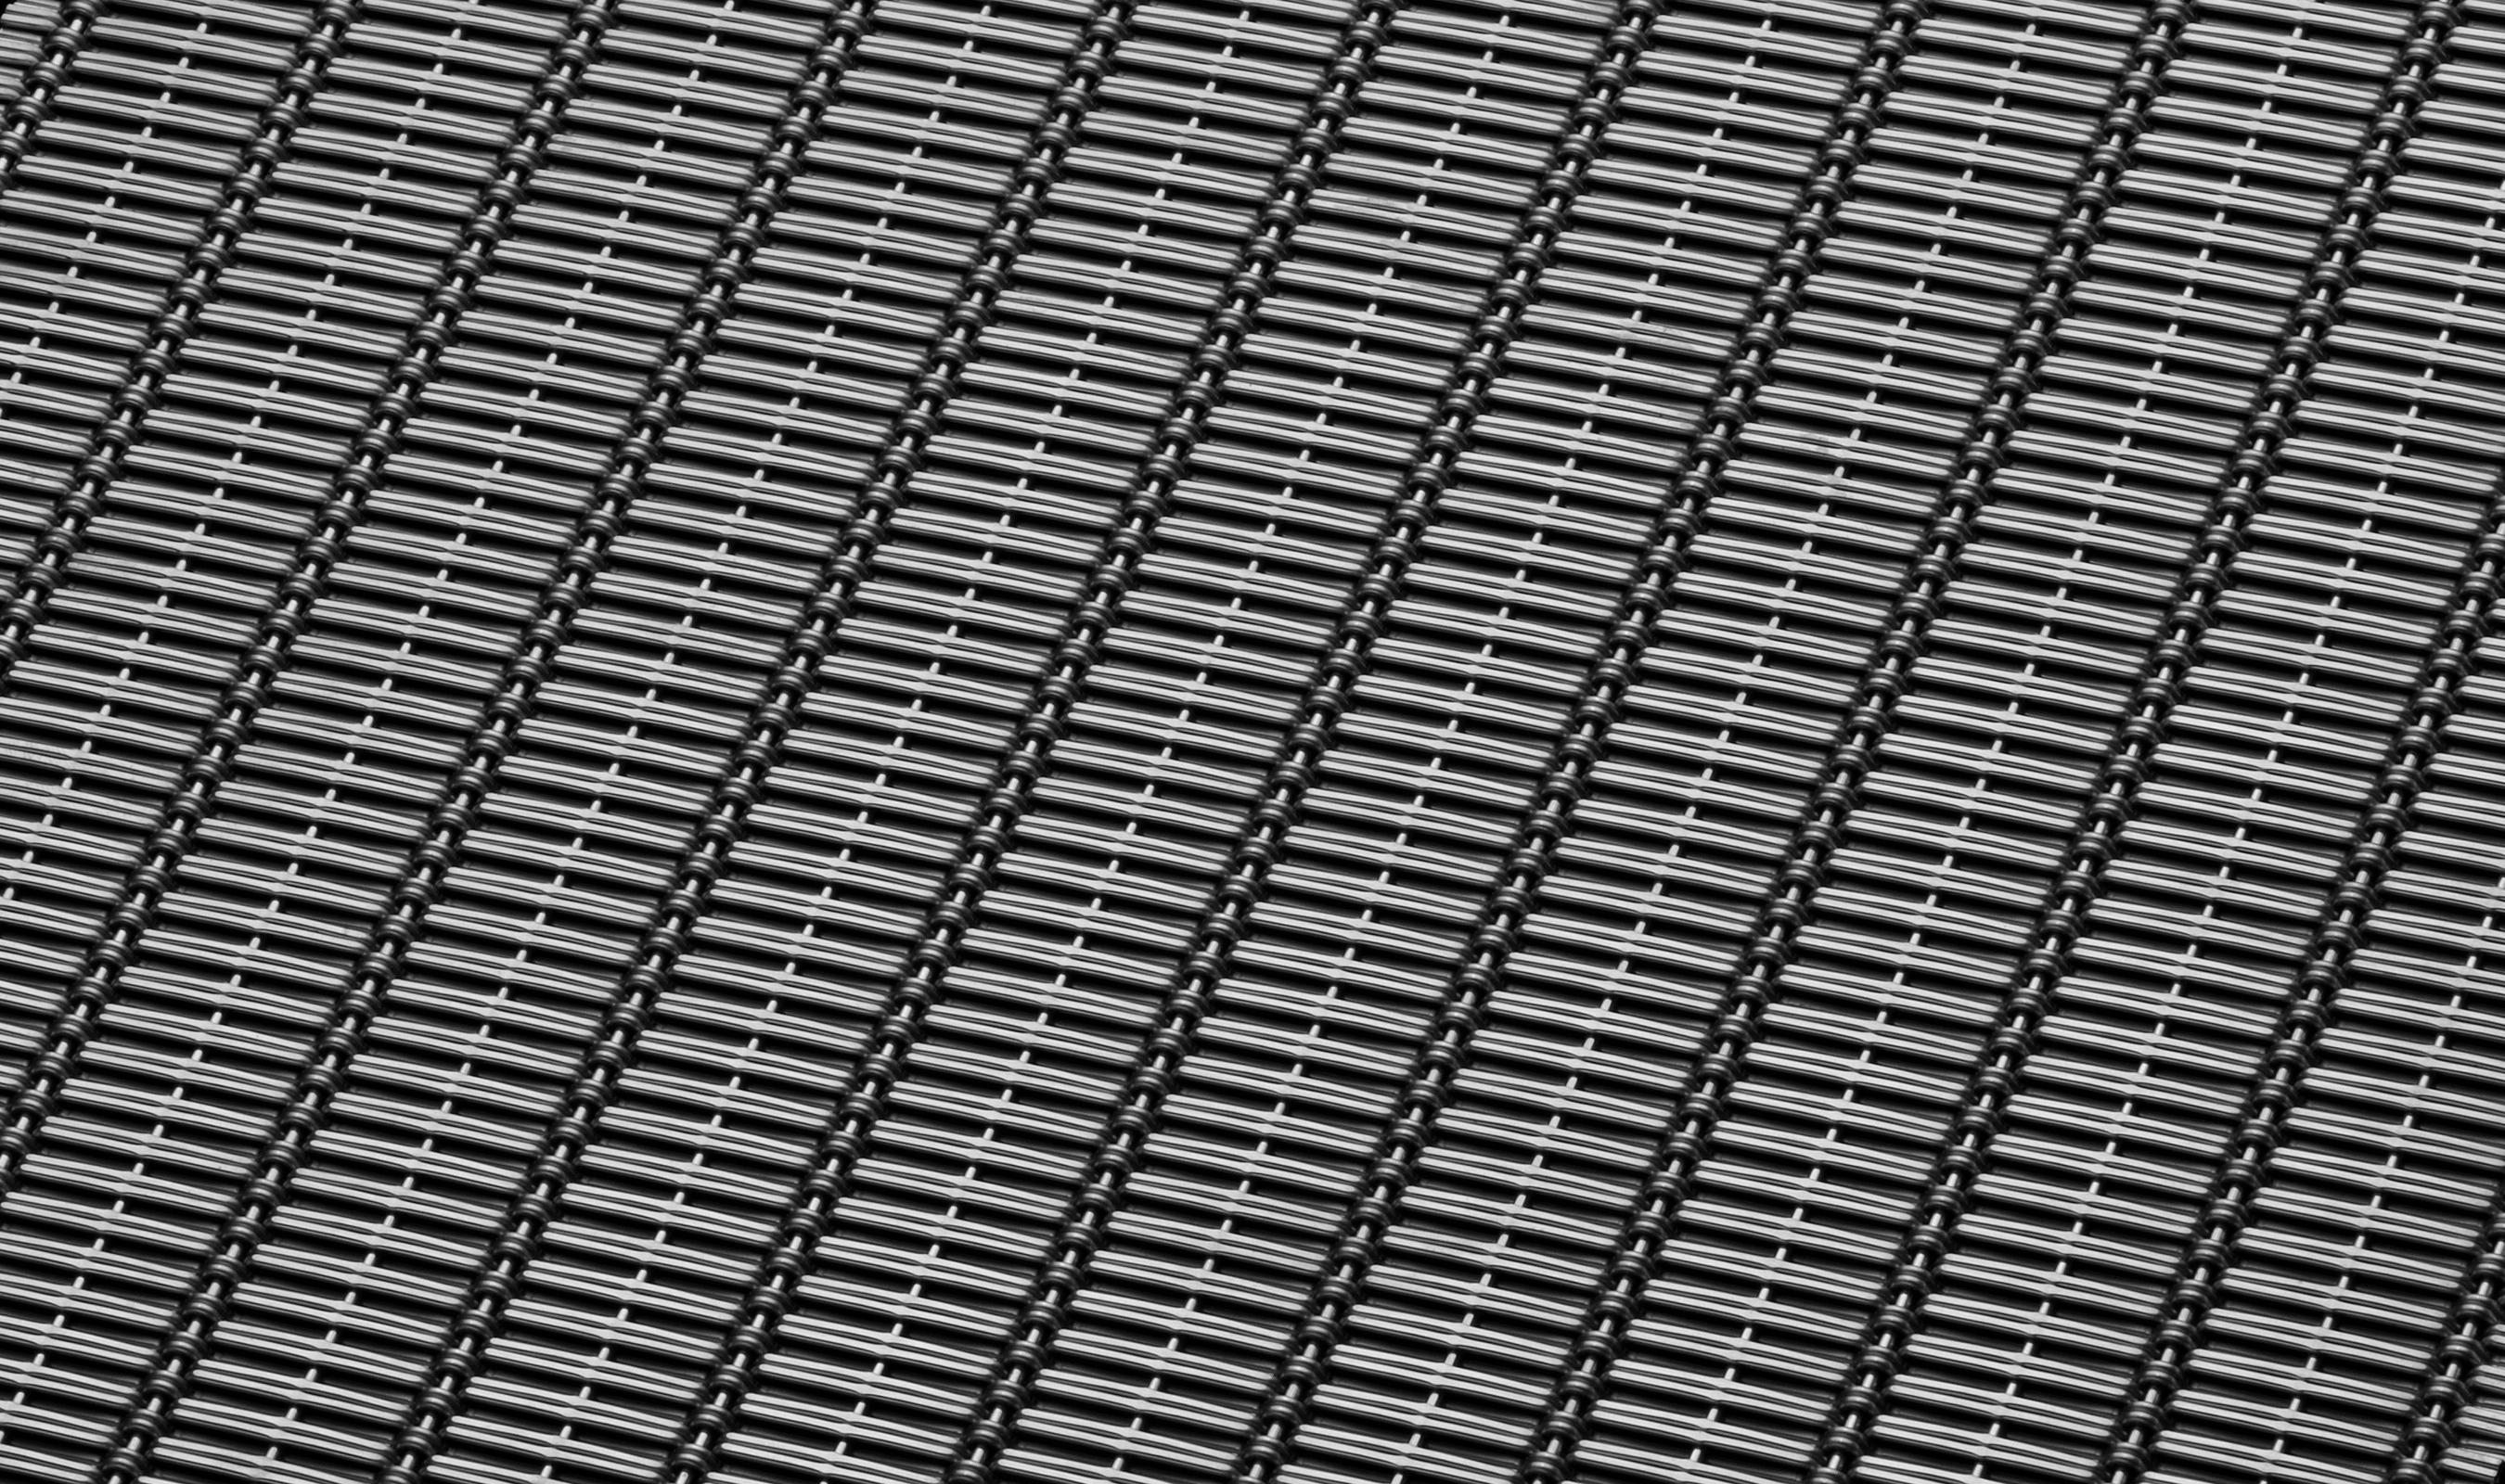 DF-14 Woven Wire Mesh Pattern